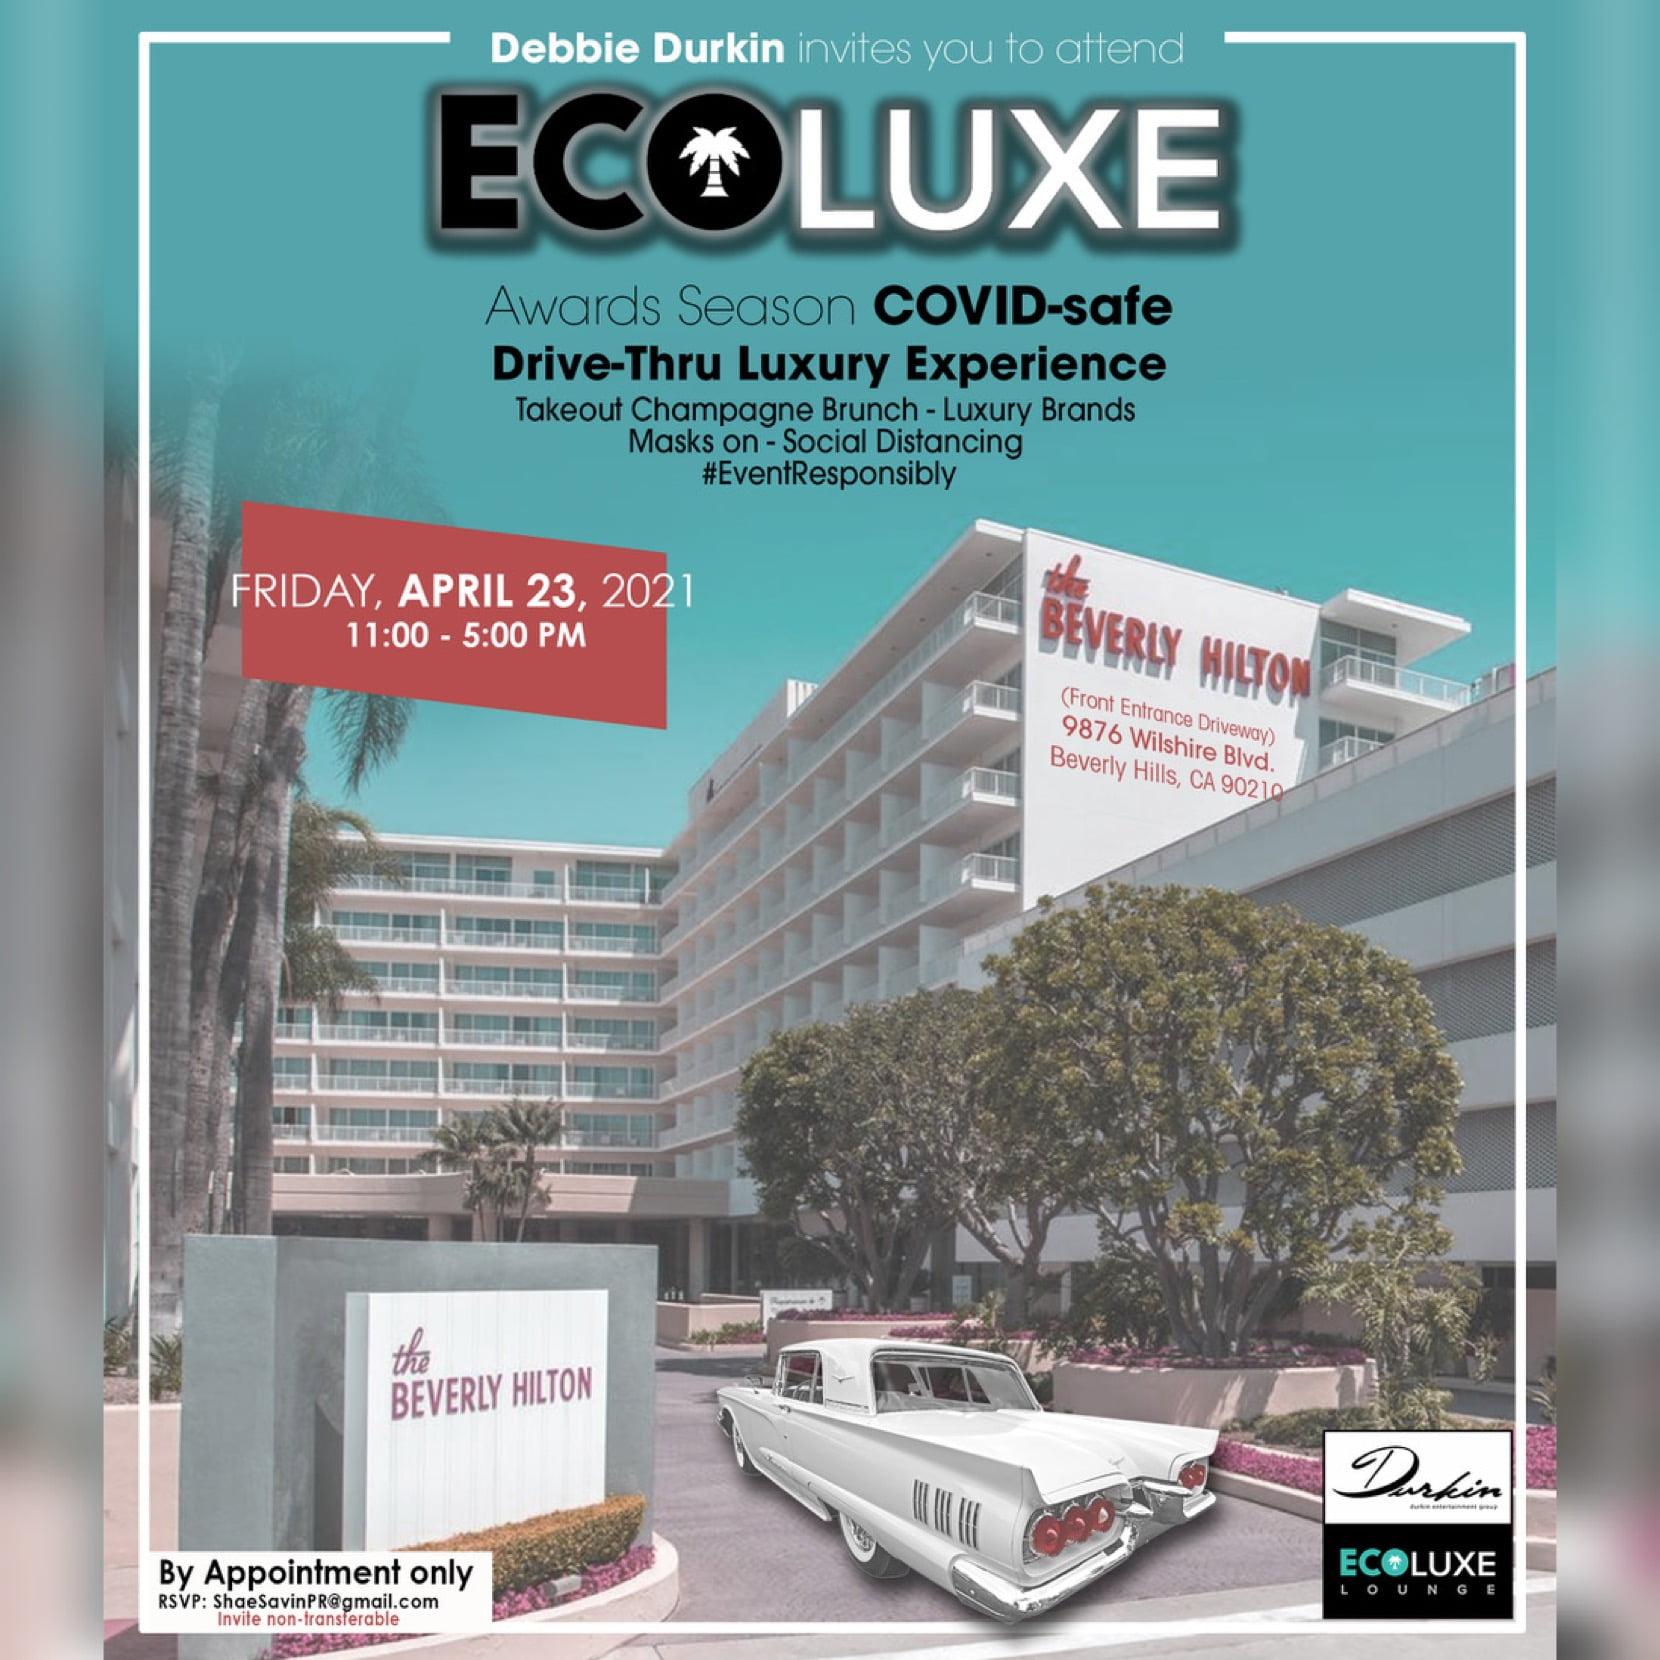 Debbie Burkin's EcoLuxe Drive-Thru image by Shae Savin PR for use by 360 Magazine